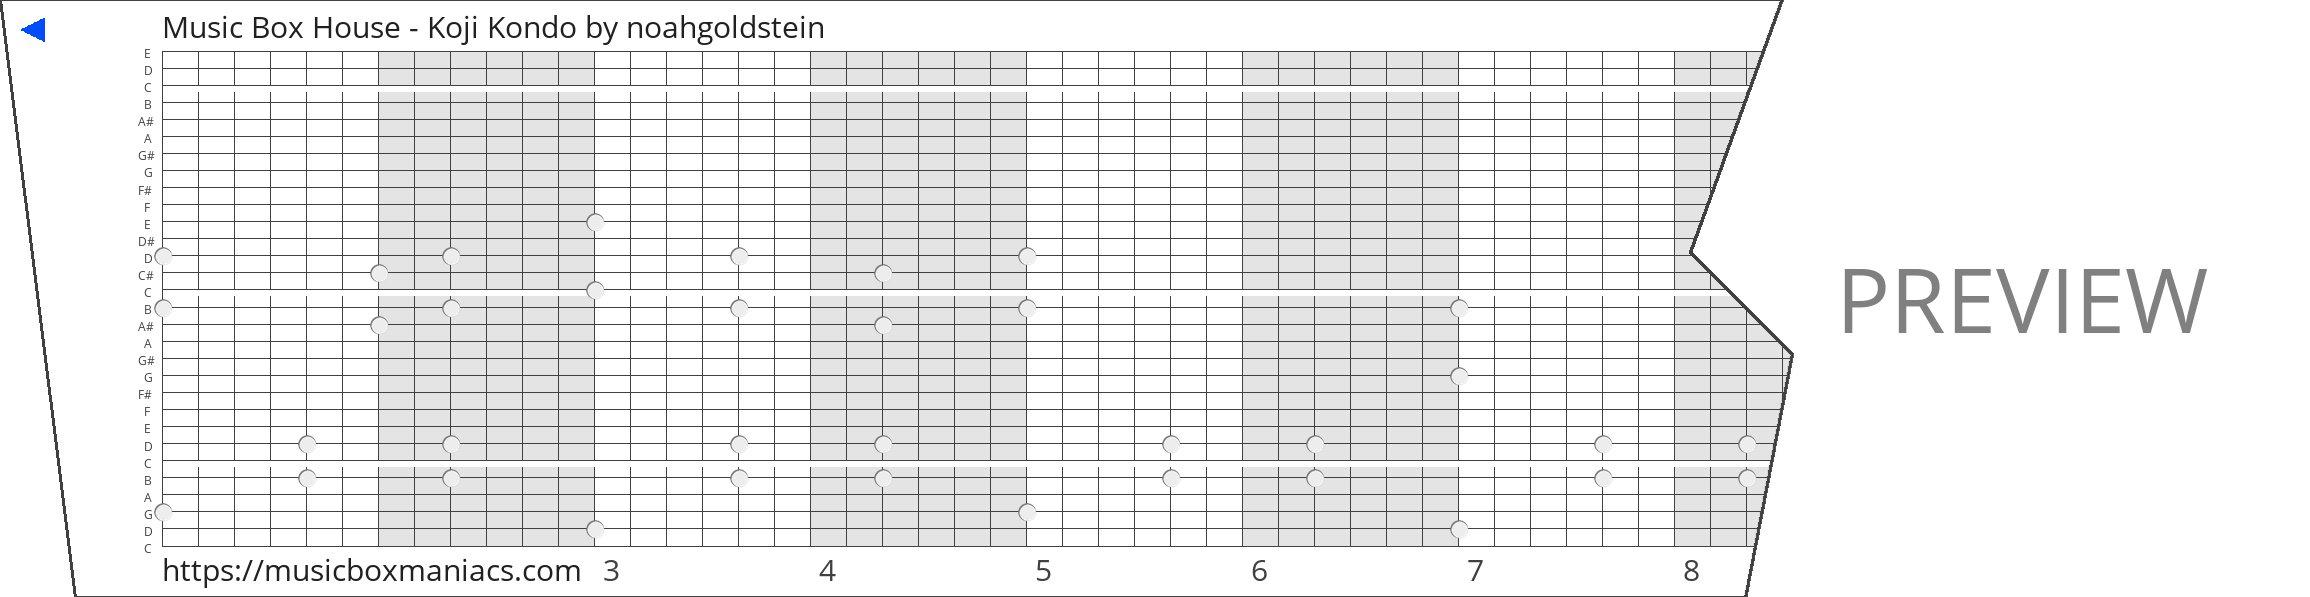 Music Box House - Koji Kondo 30 note music box paper strip